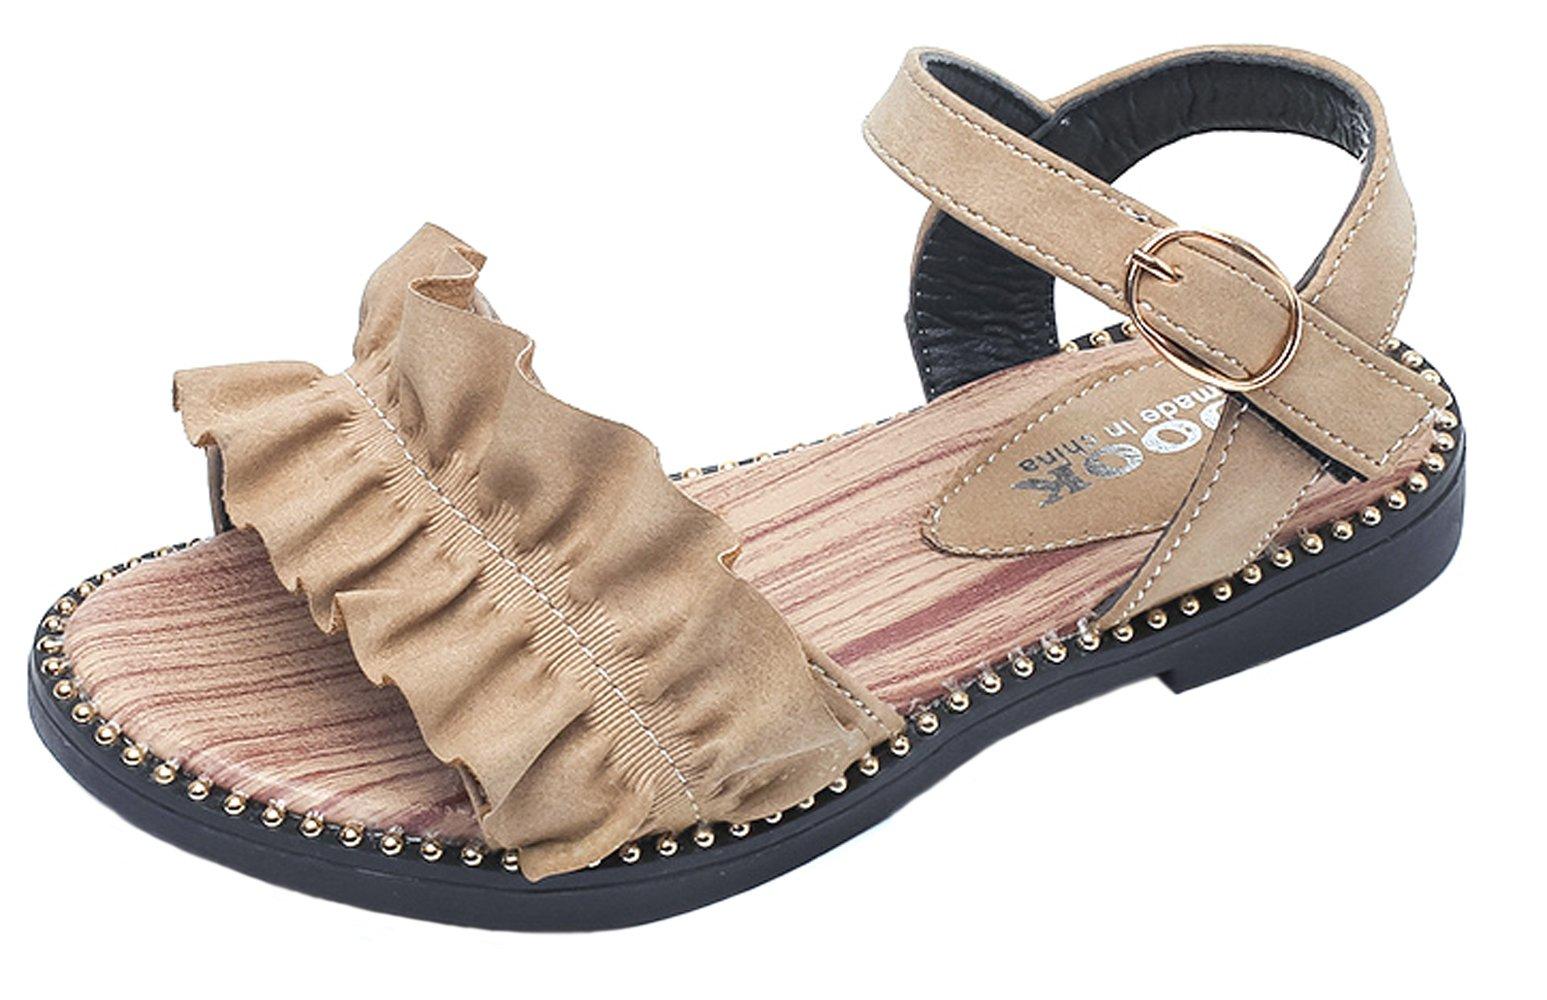 WUIWUIYU Girls Ankle Strap Buckle Flower Leather Walking Flat Sandals Open Toe Summer Princess Shoes